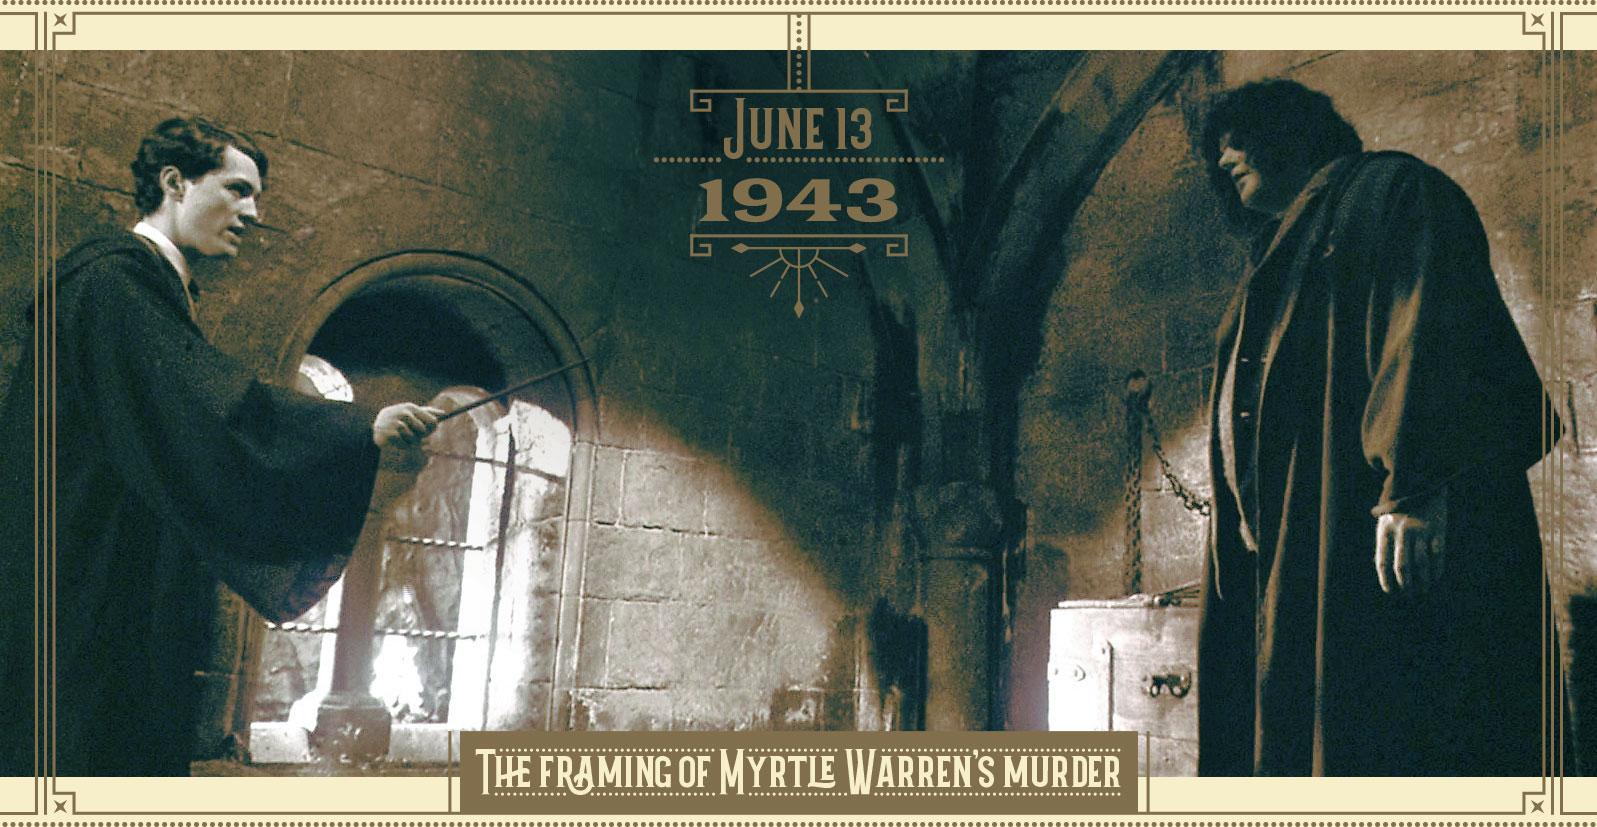 The framing of Myrtle Warren's murder